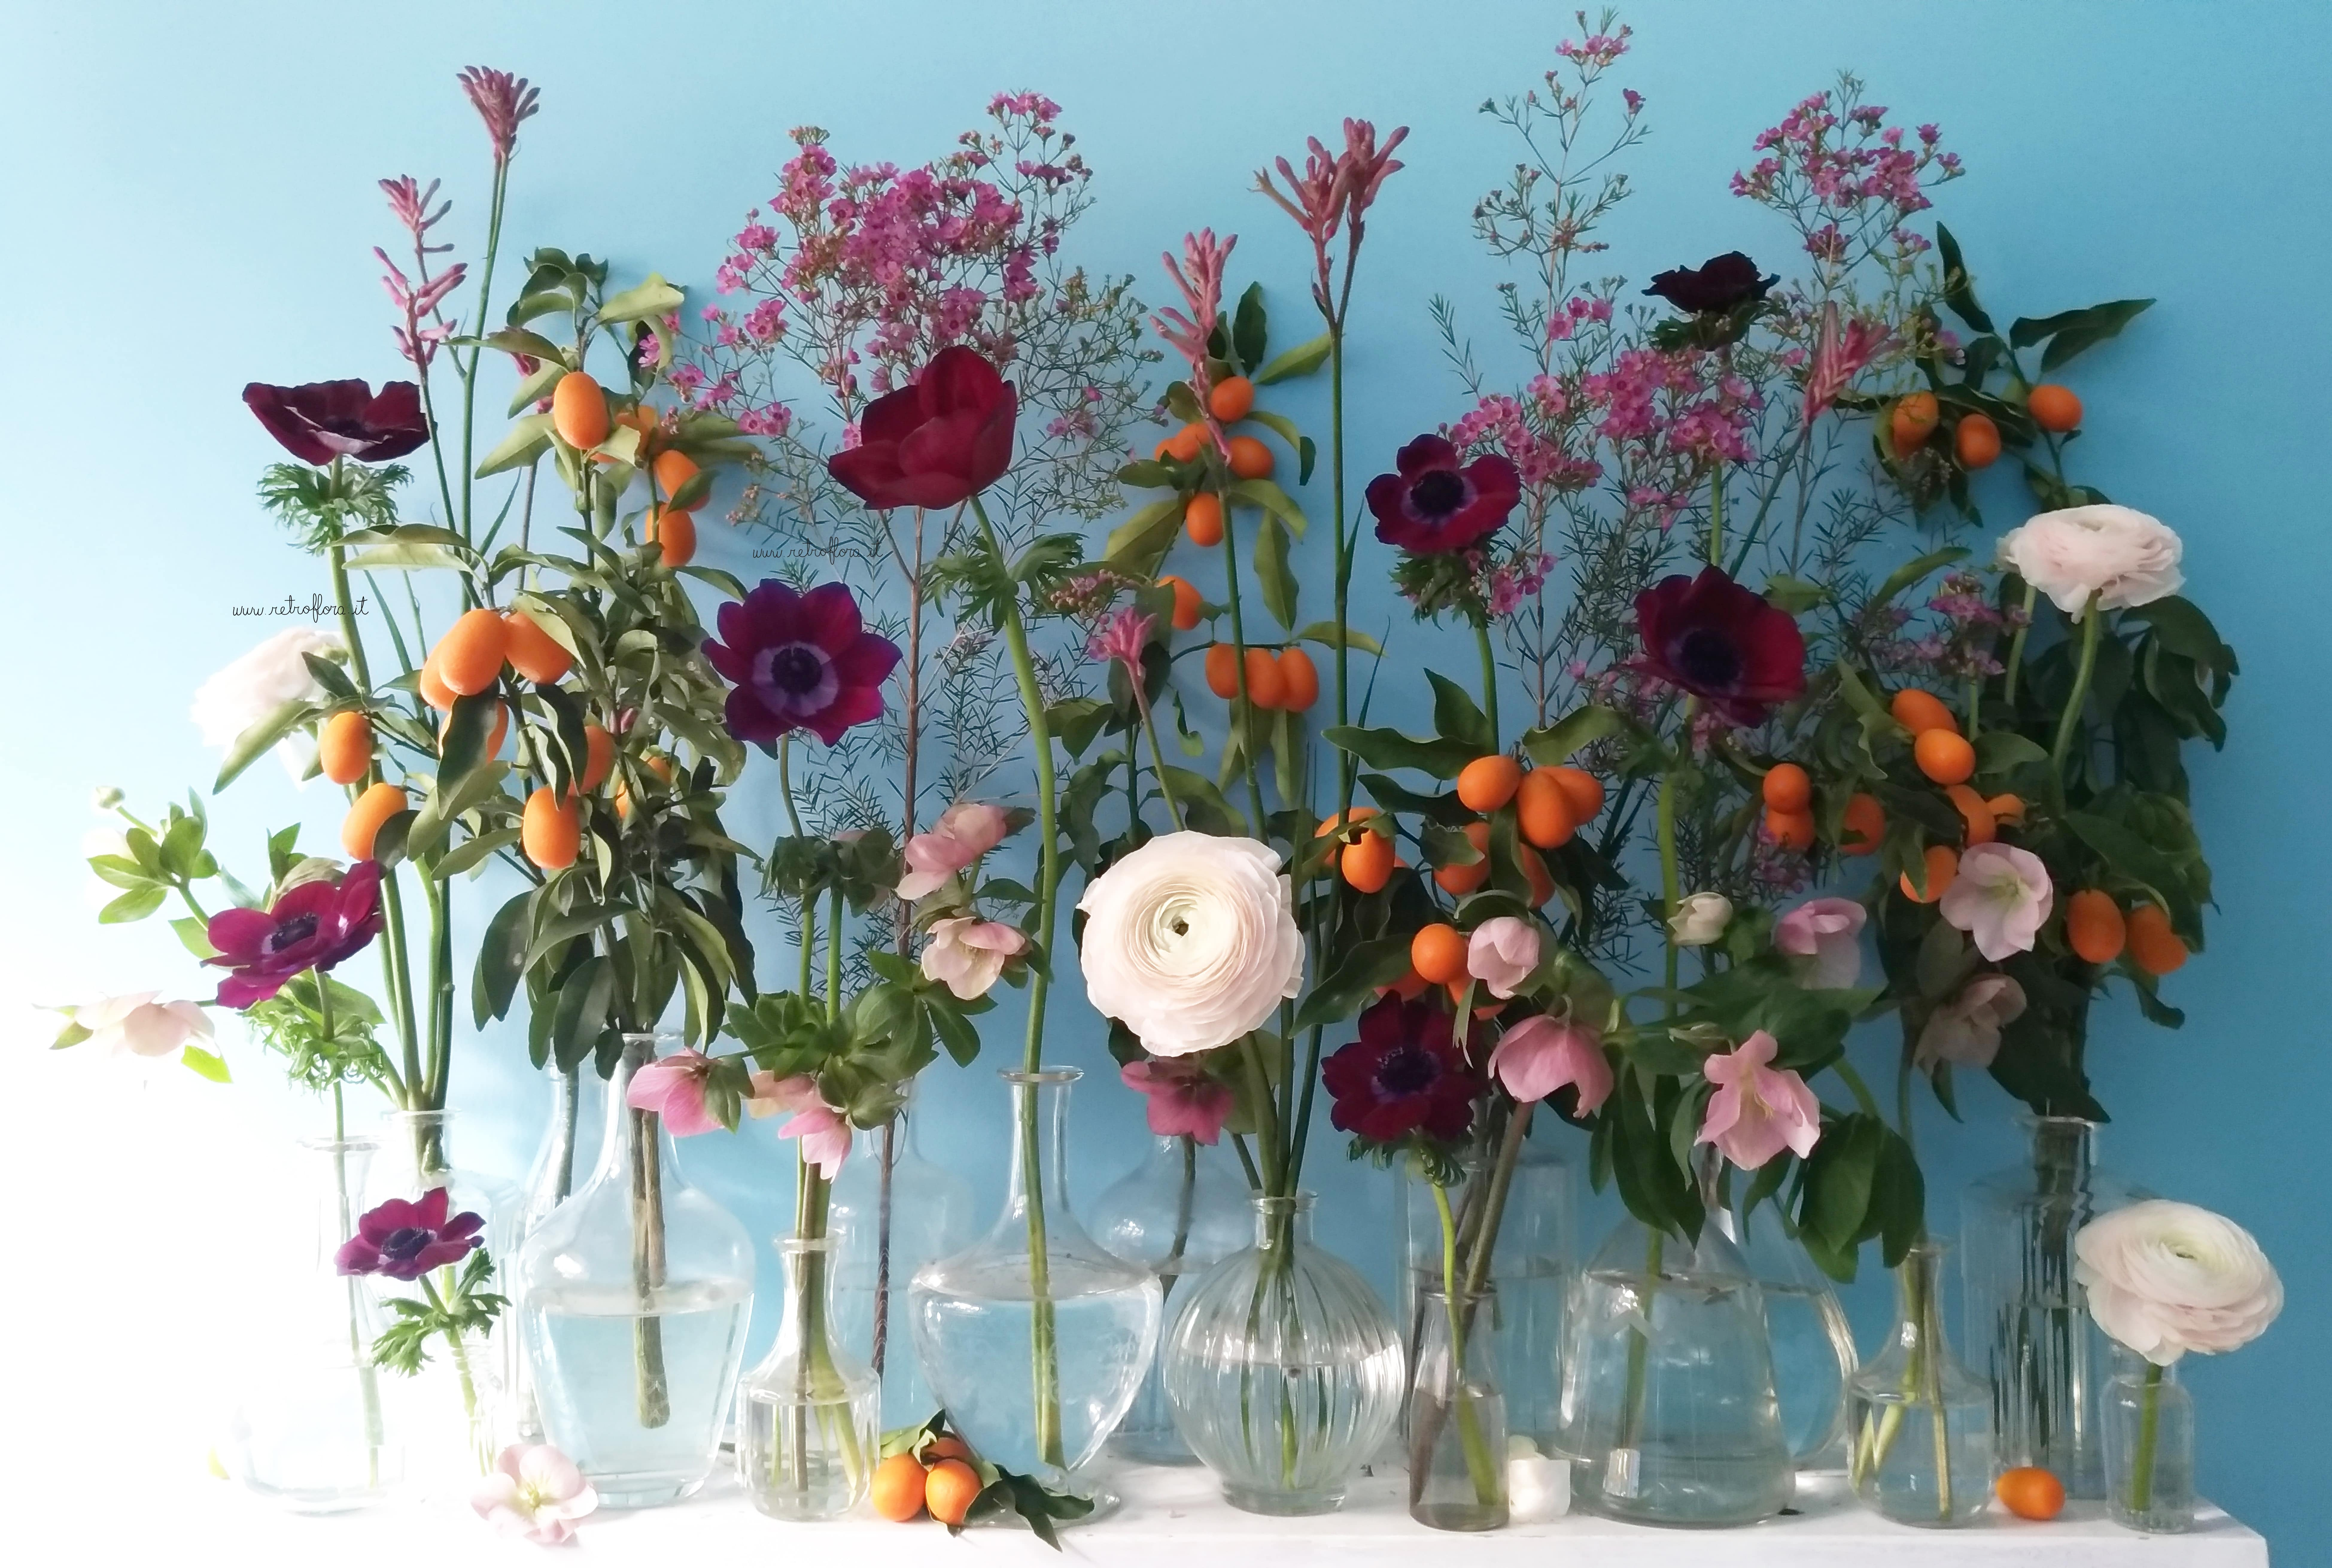 La Mensola Fiorita Anemoni e Mandarino Cinese - Retroflora